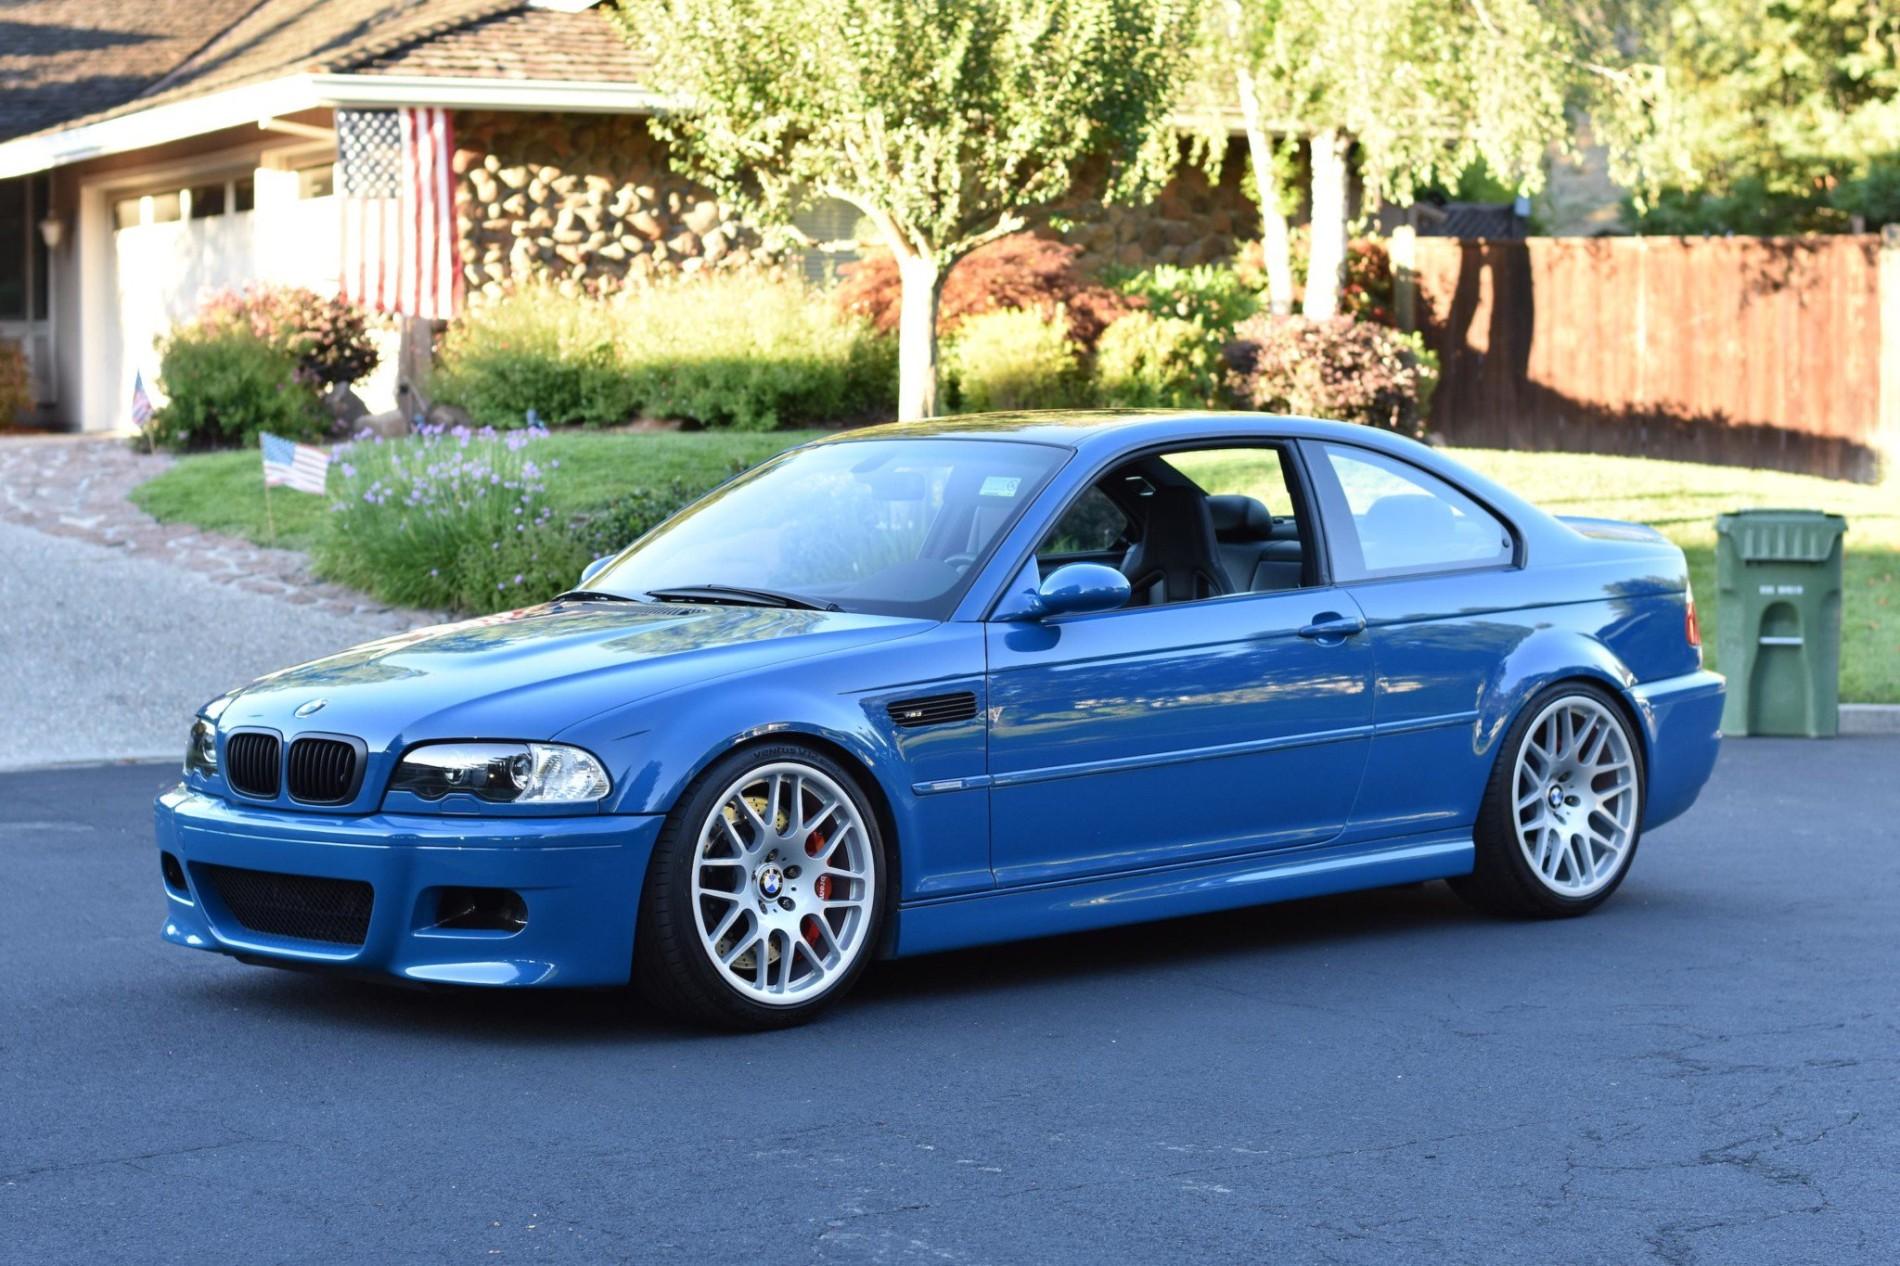 BMW M3 E46 de vanzare - BMW M3 E46 de vanzare